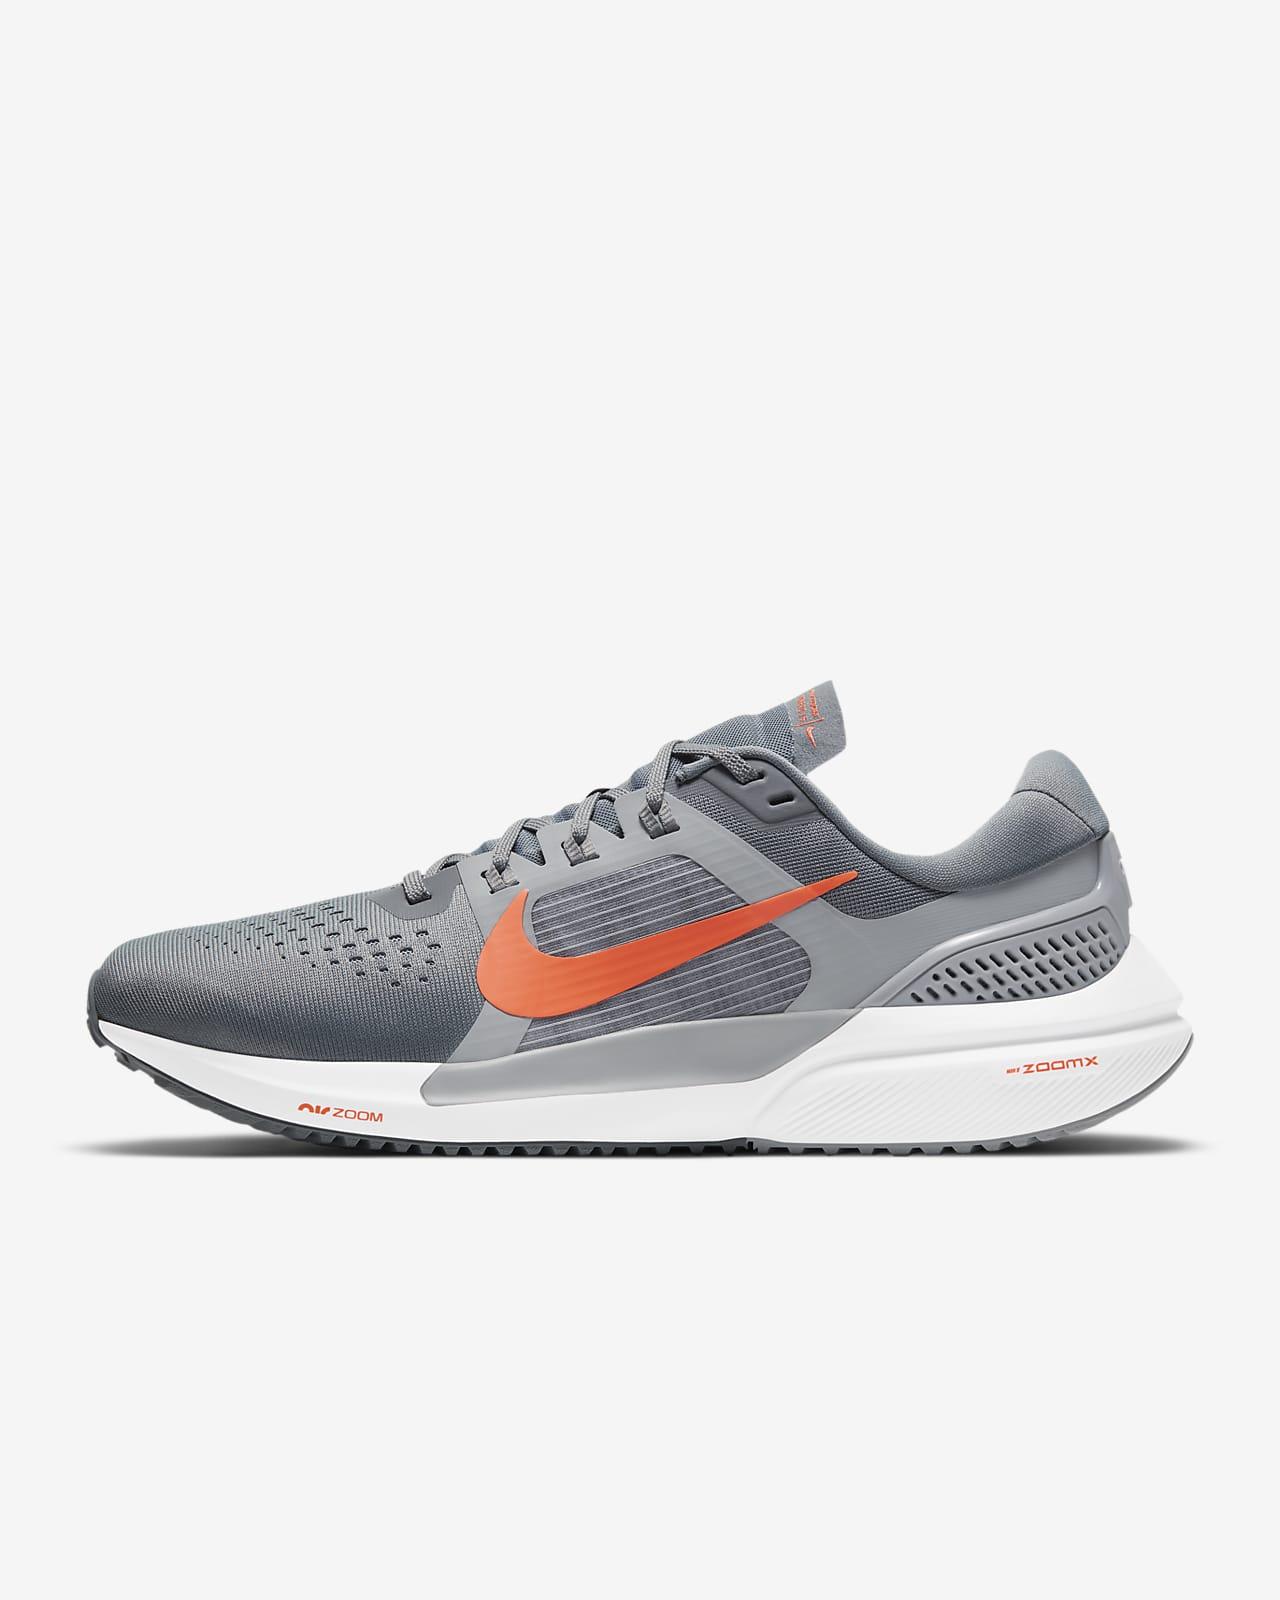 Nike Air Zoom Vomero 15 Herren-Laufschuh